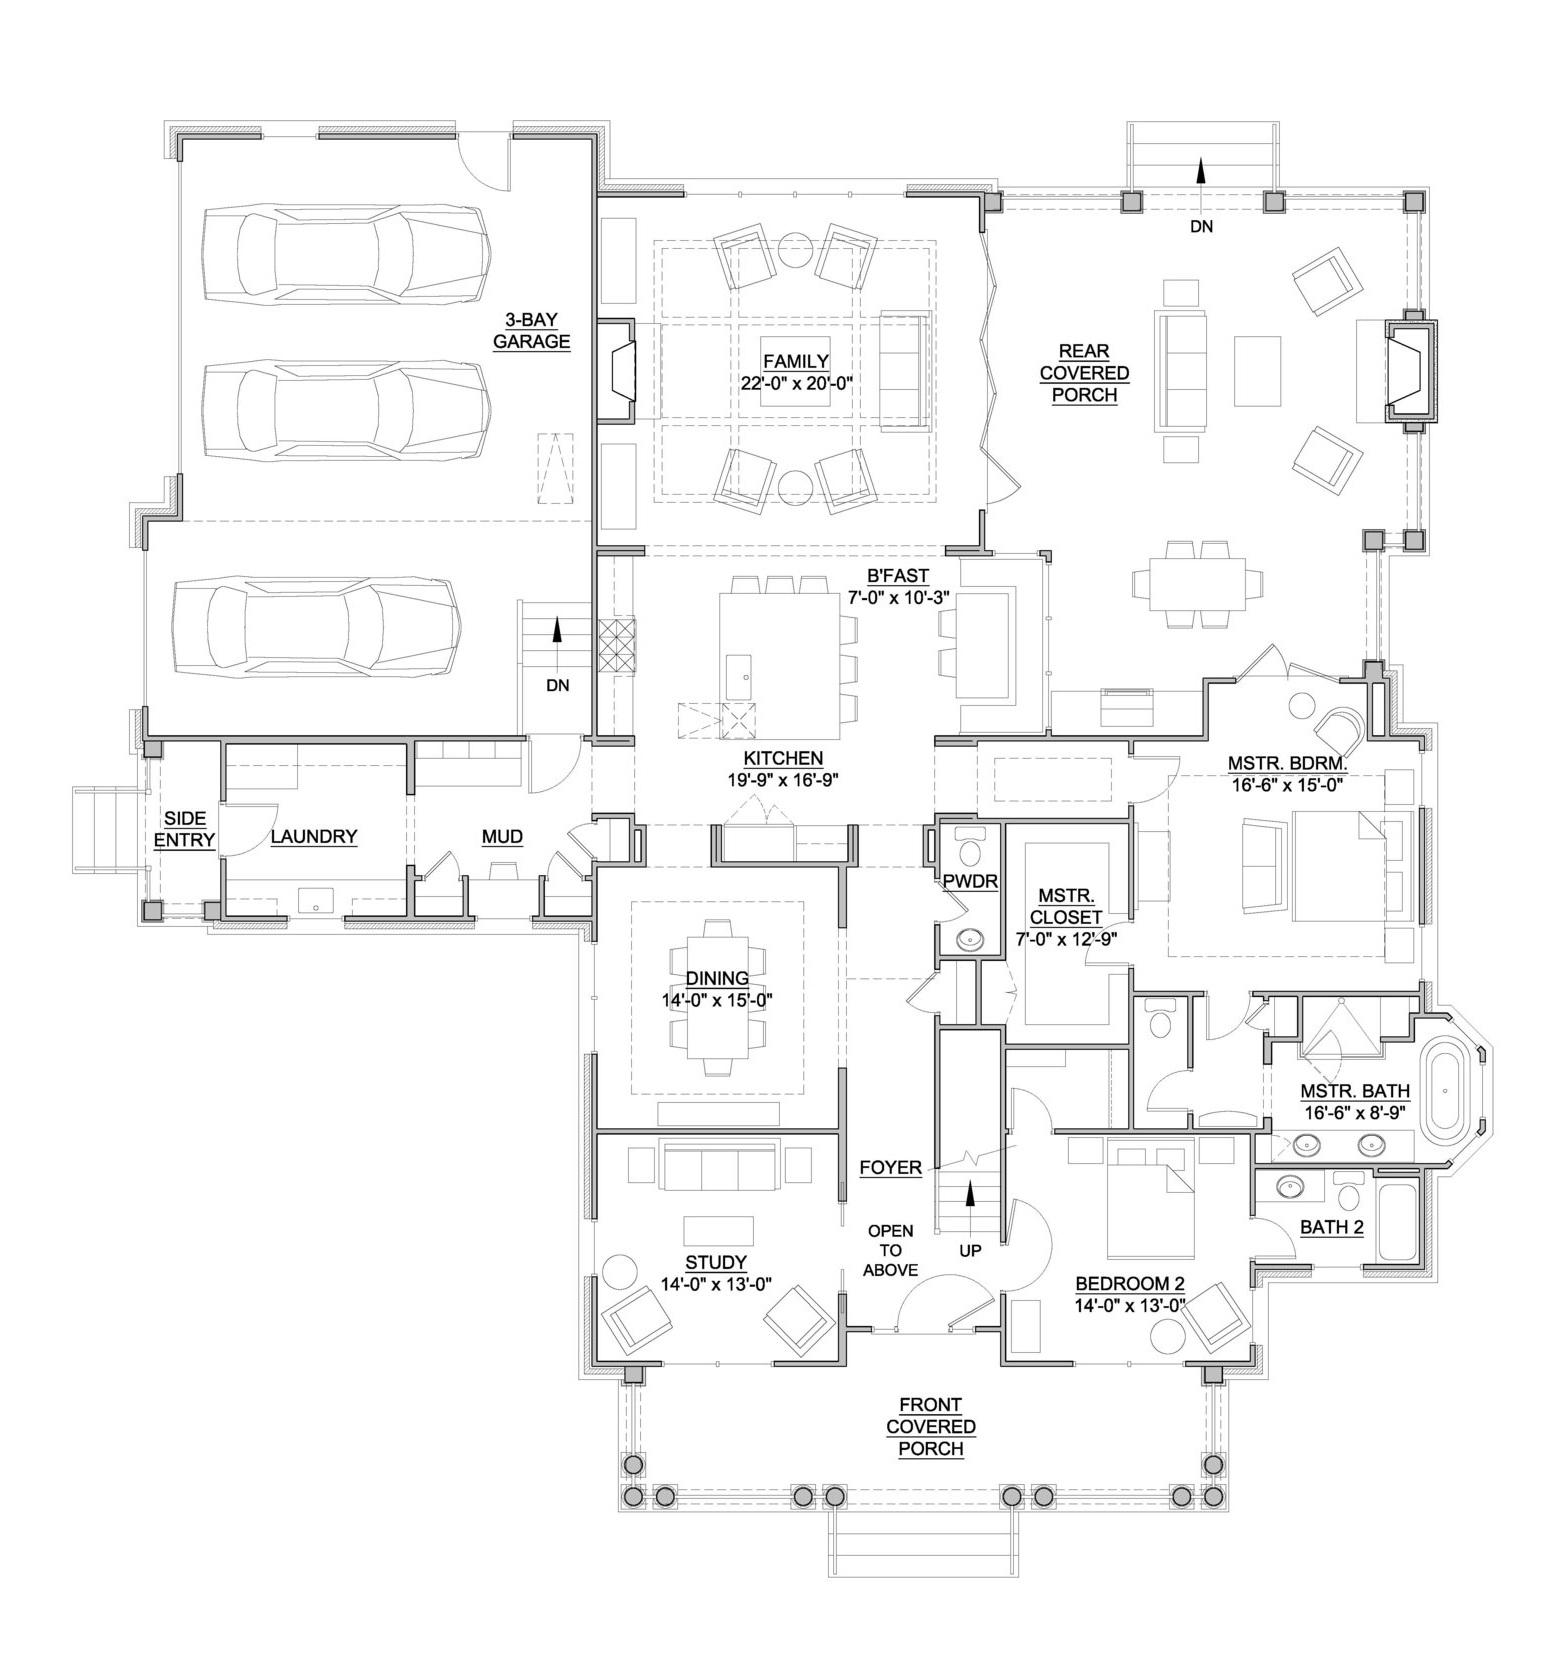 Riverchase_Eaton+C+CRAWL_%282%29+First+Floor+Plan+%5B24x36%5D.jpg